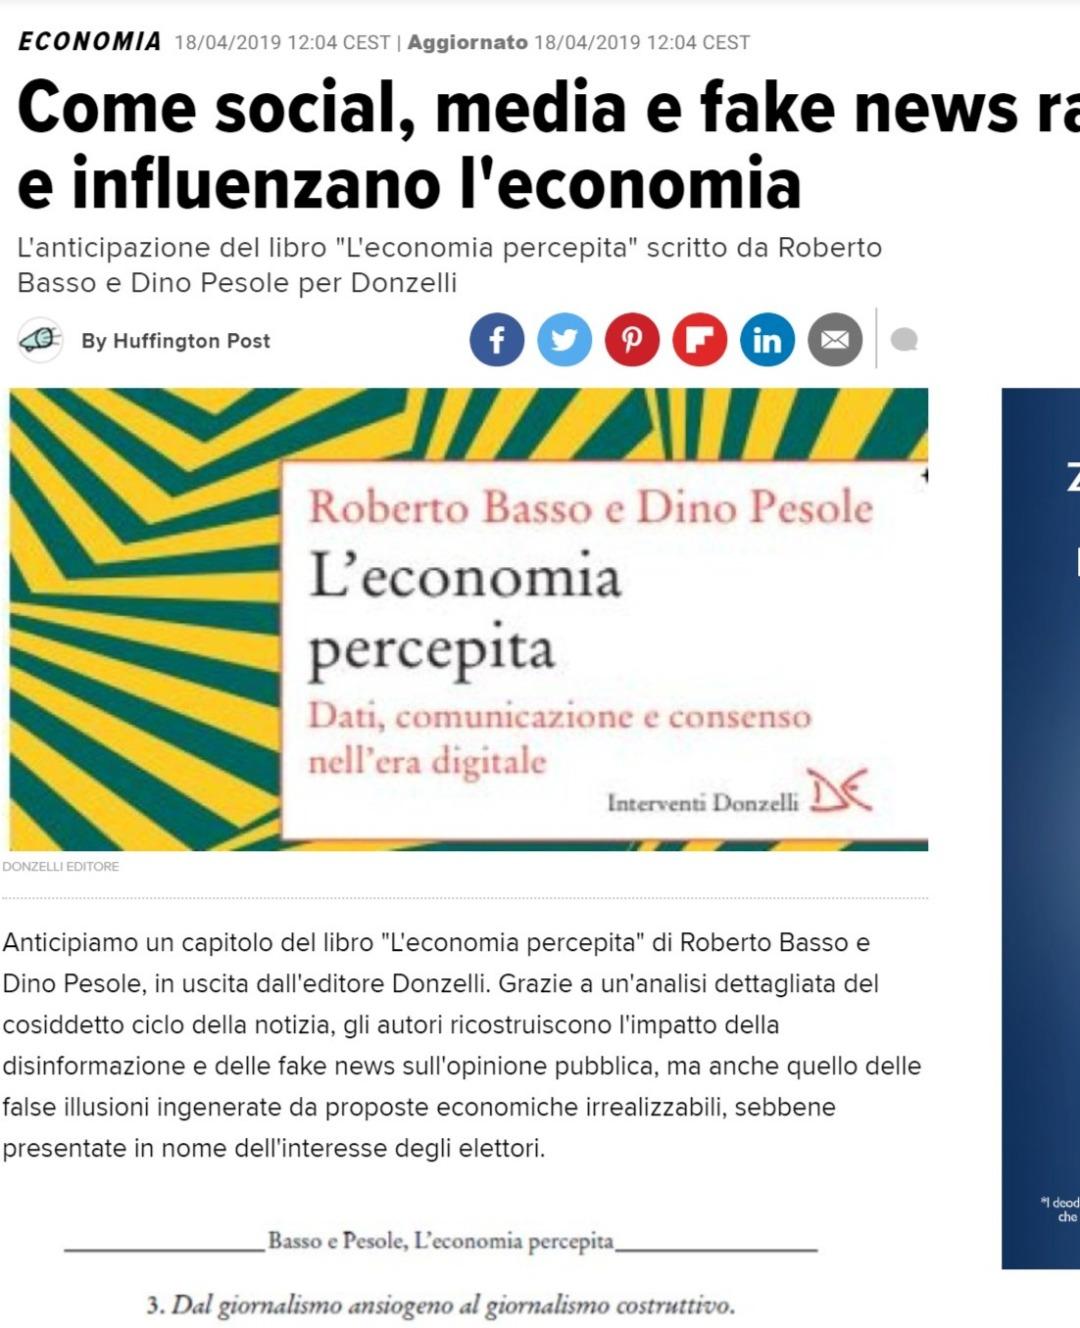 Screenshot of Come social, media e fake news raccontano e influenzano l'economia _ L'Huffington Post